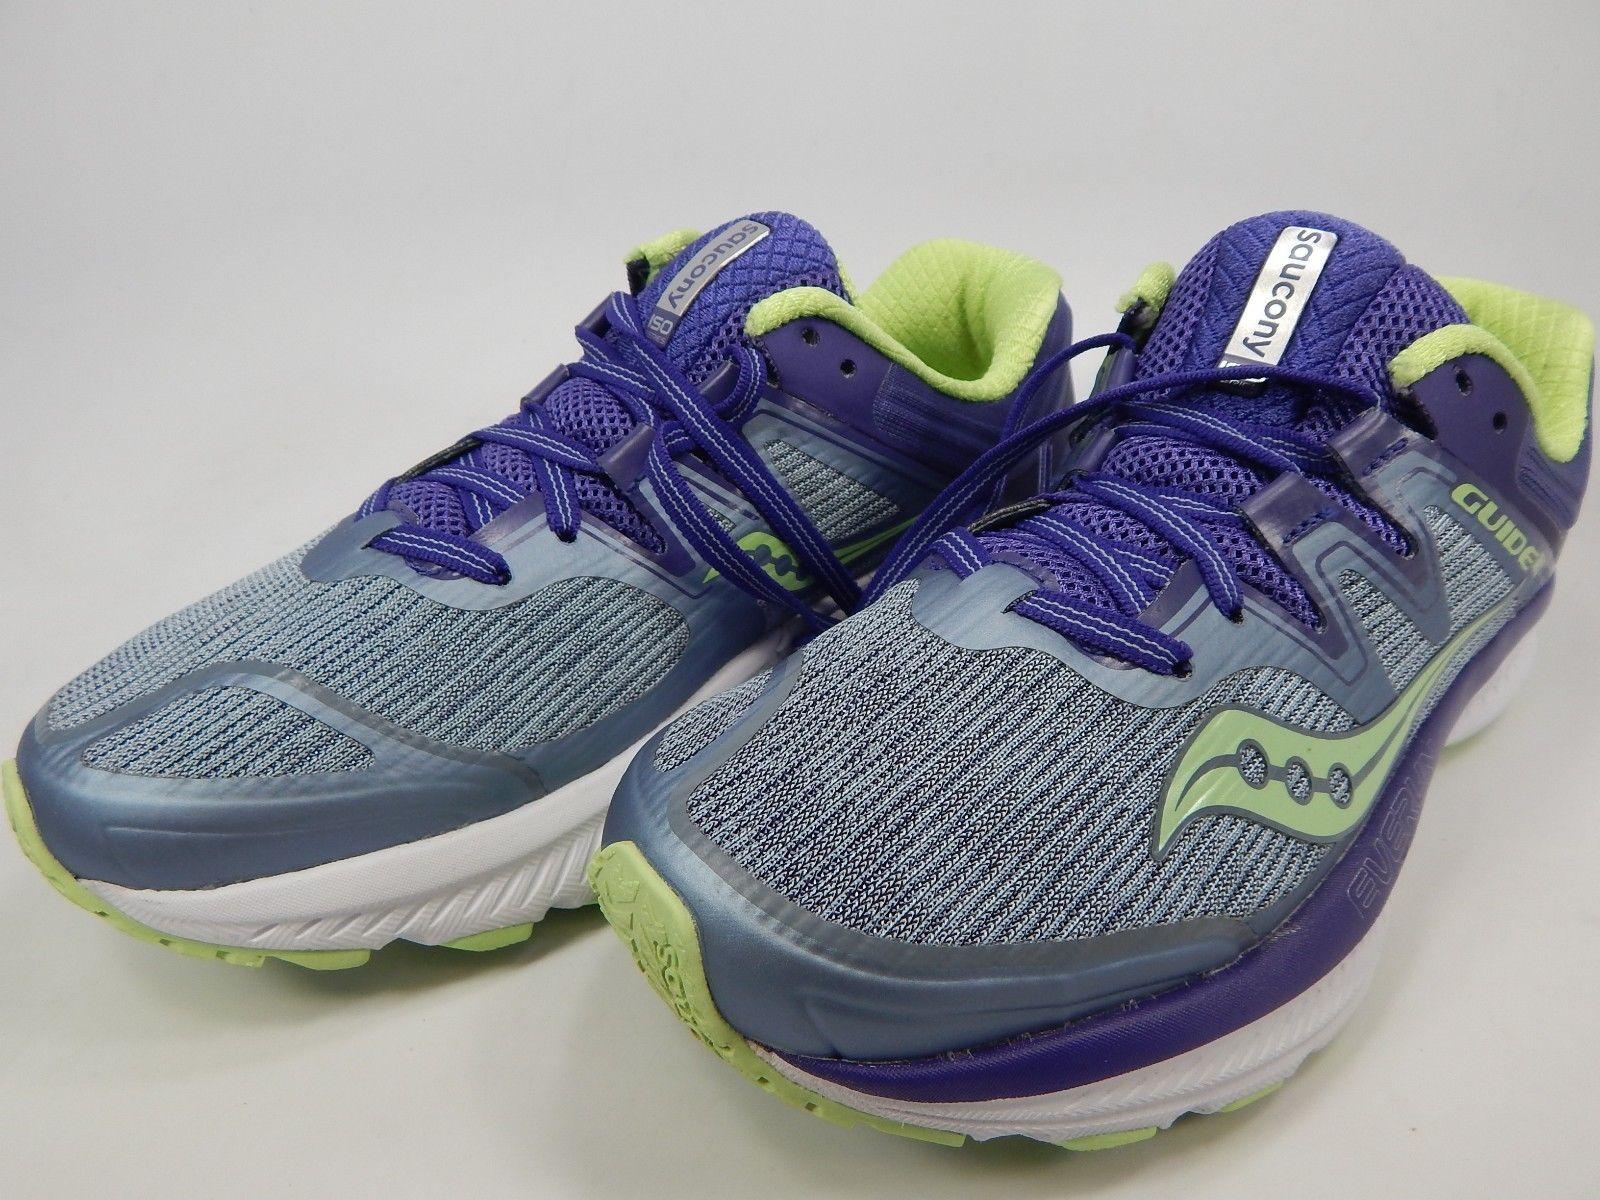 Saucony Guide ISO Size 7.5 M (B) EU 38.5 Women's Running Shoes Purple S10415-1